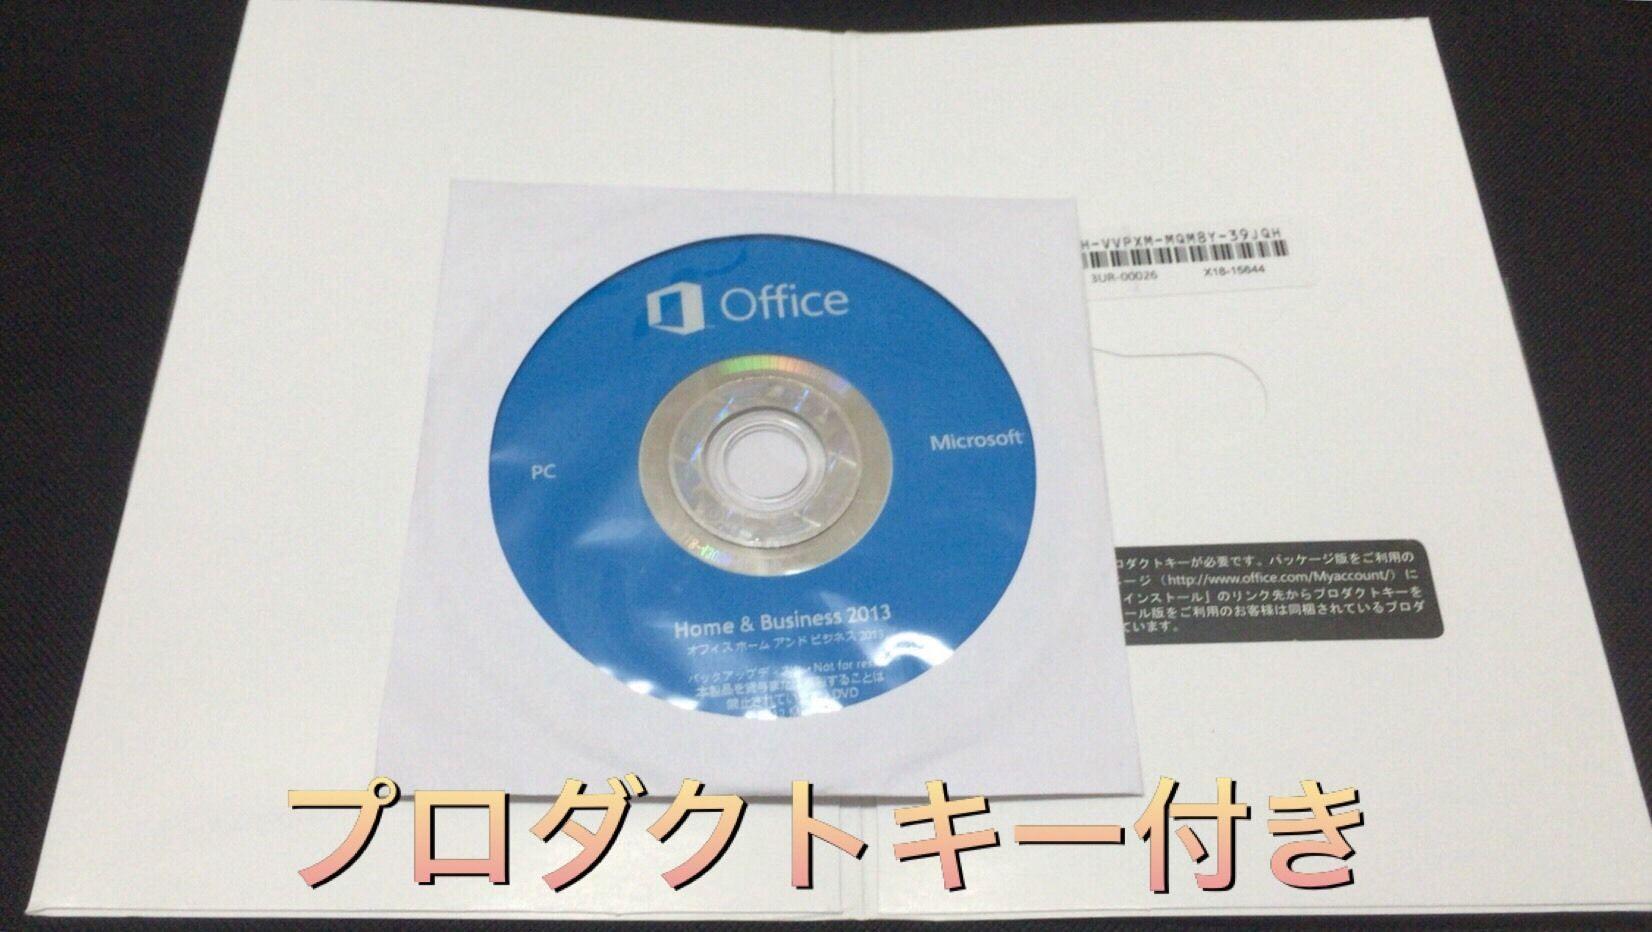 Microsoft office 2013 home&business製品版